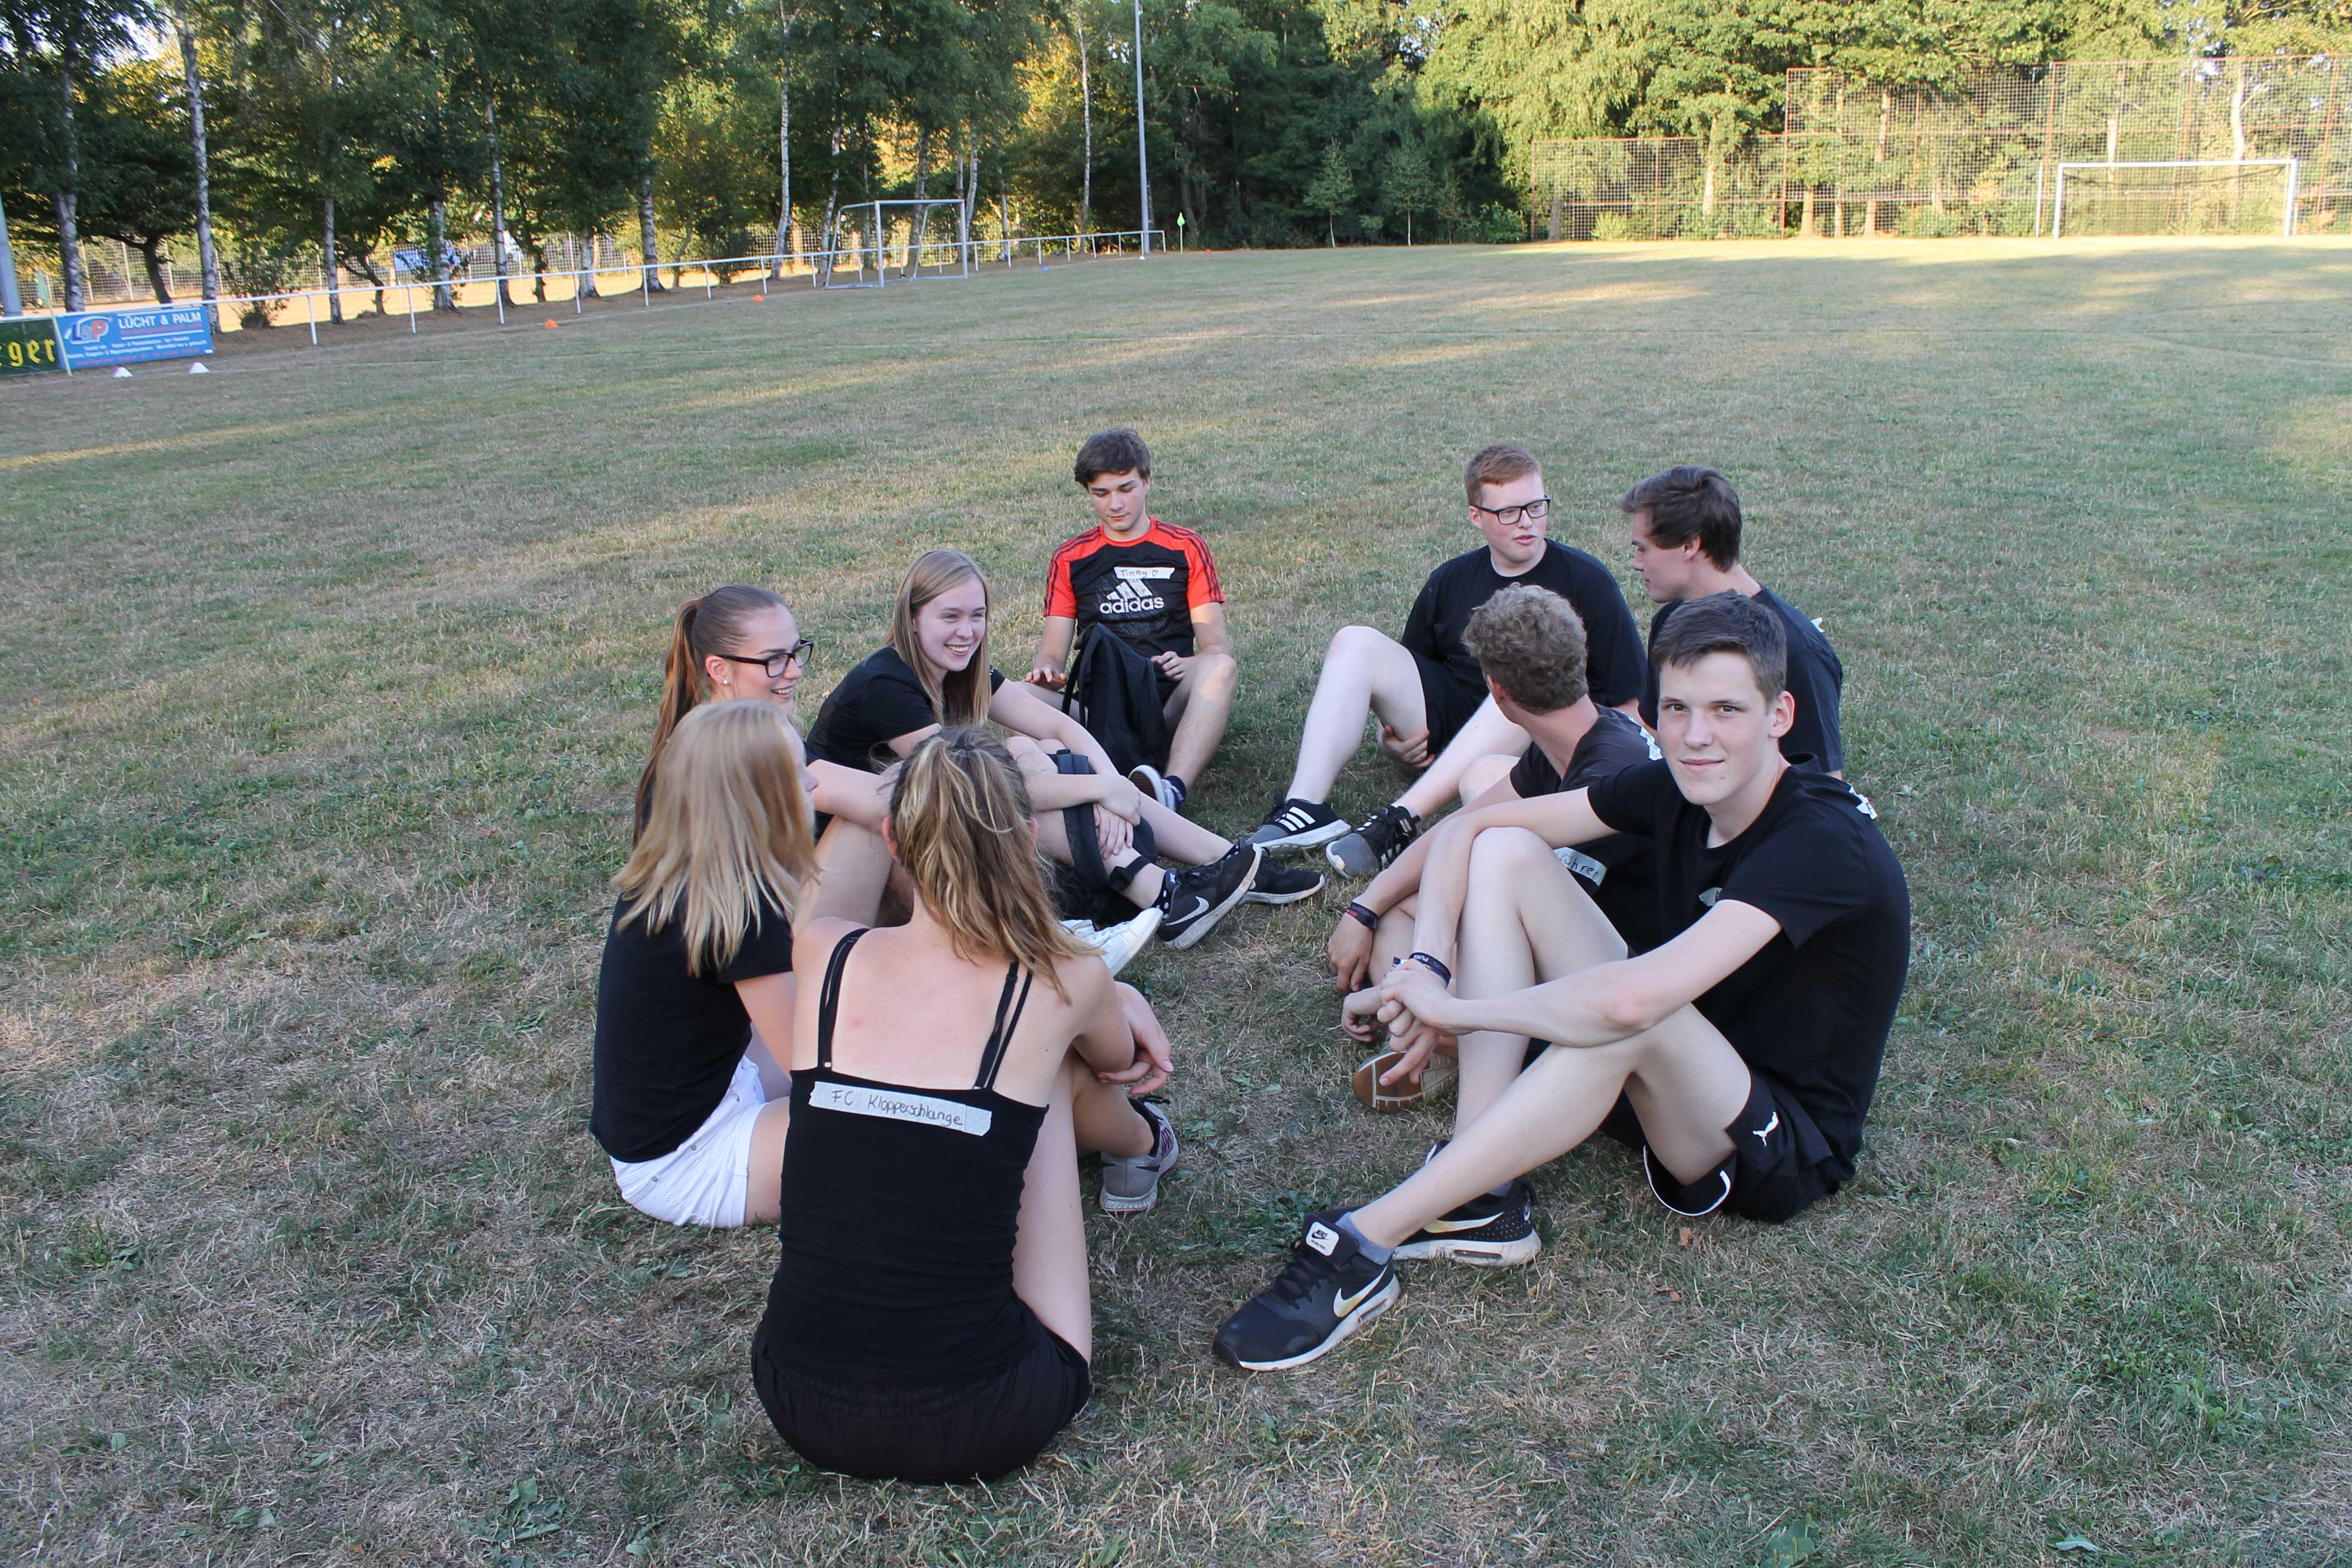 2018-07-27 Sportwoche - Flunkyball Turnier (50)